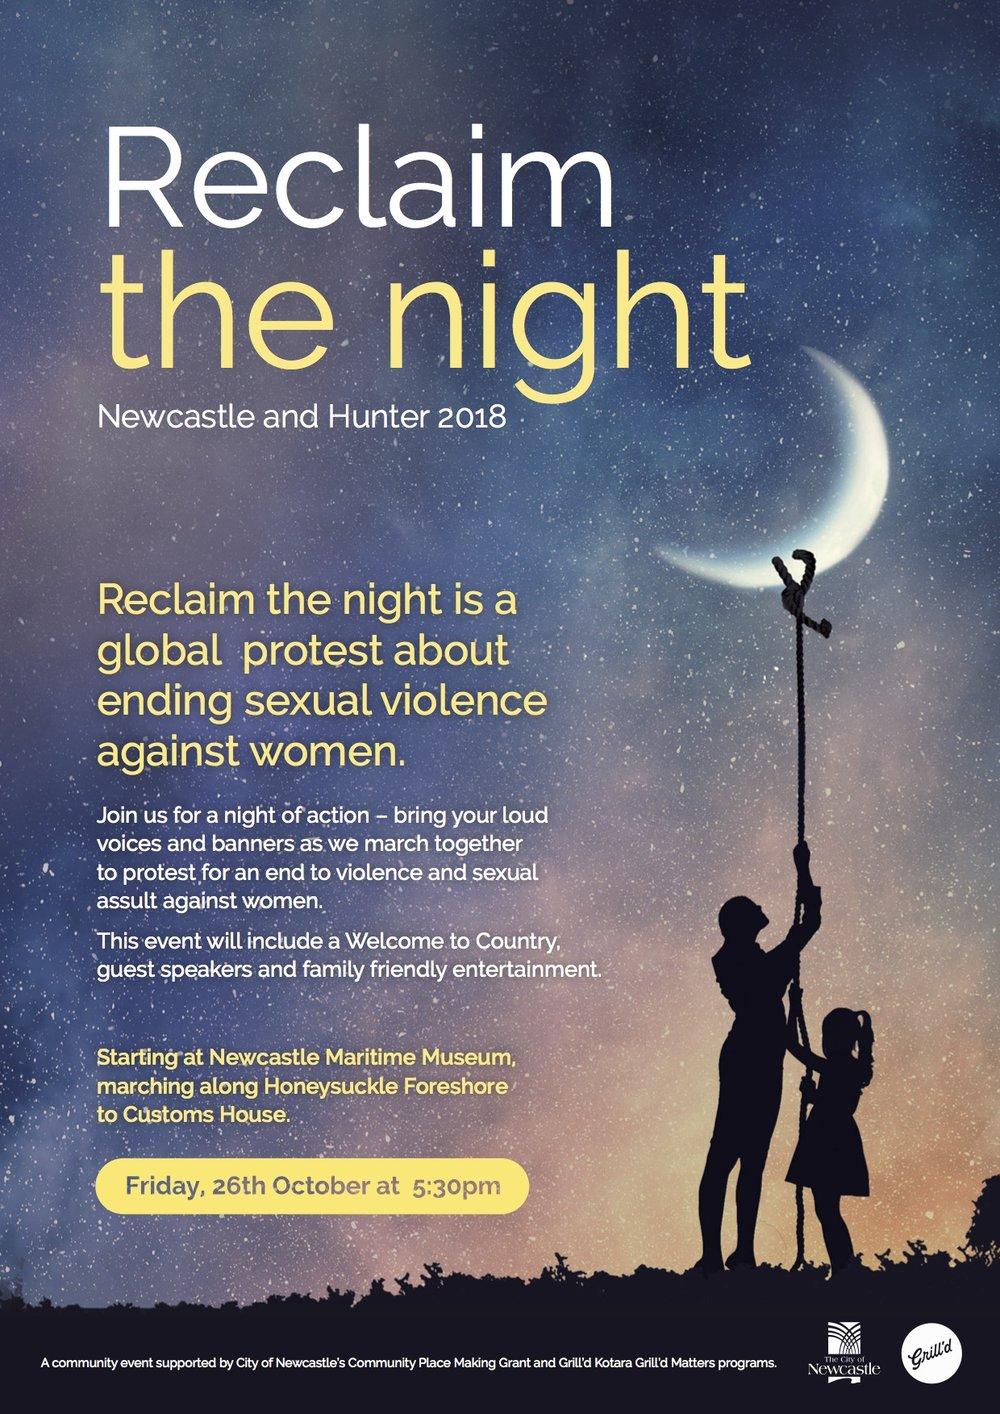 20181002 Reclaim the night poster.jpg